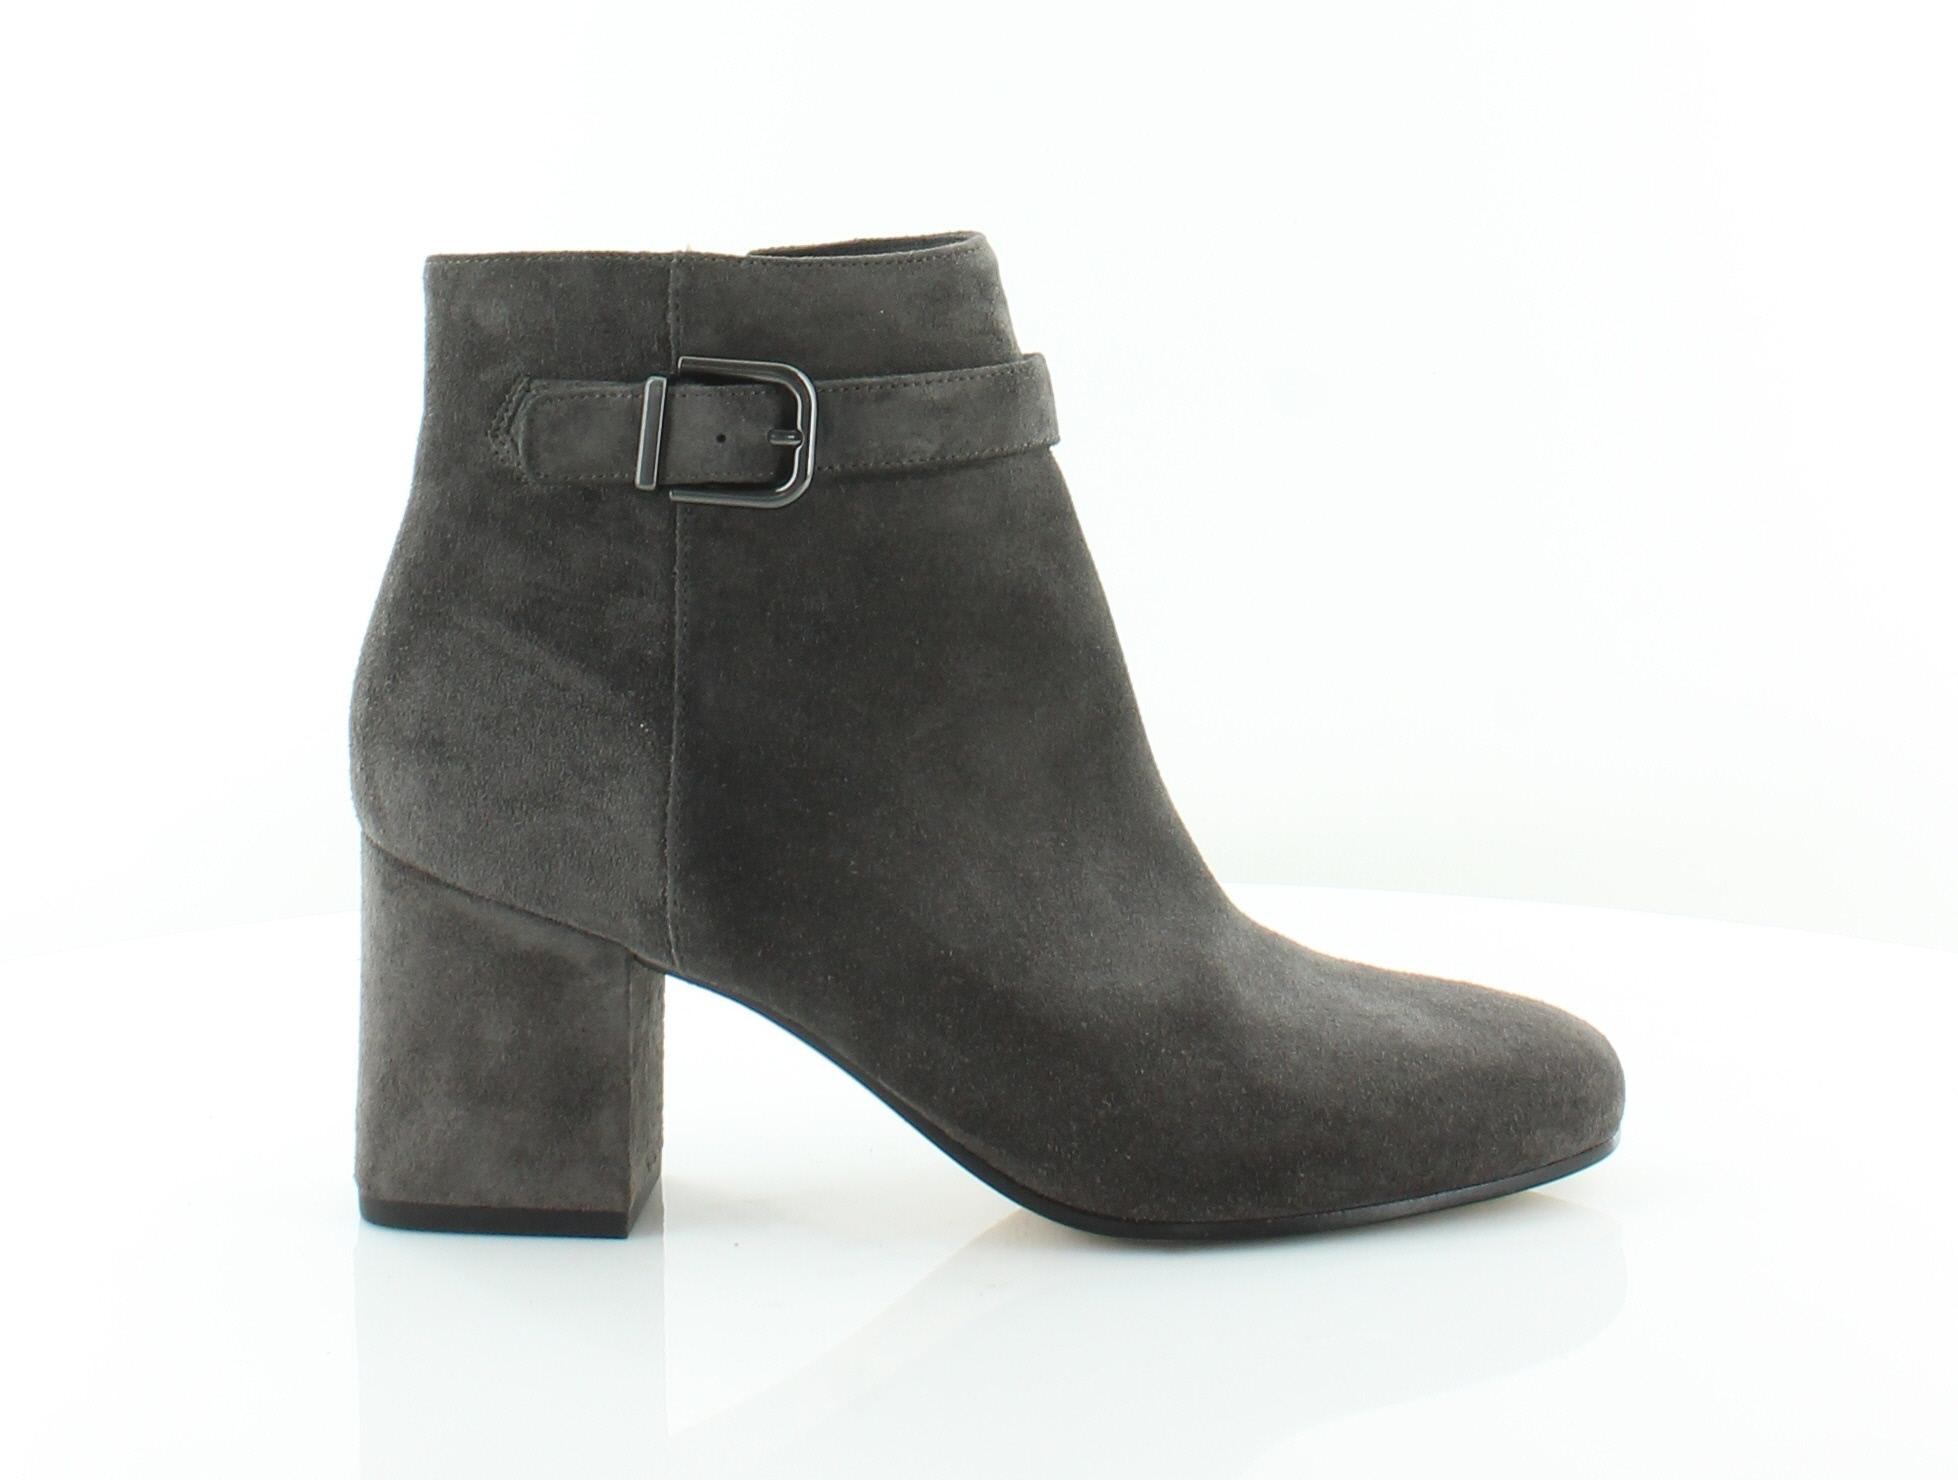 Via Spiga Maxine Women's Boots Steel Size 7 M